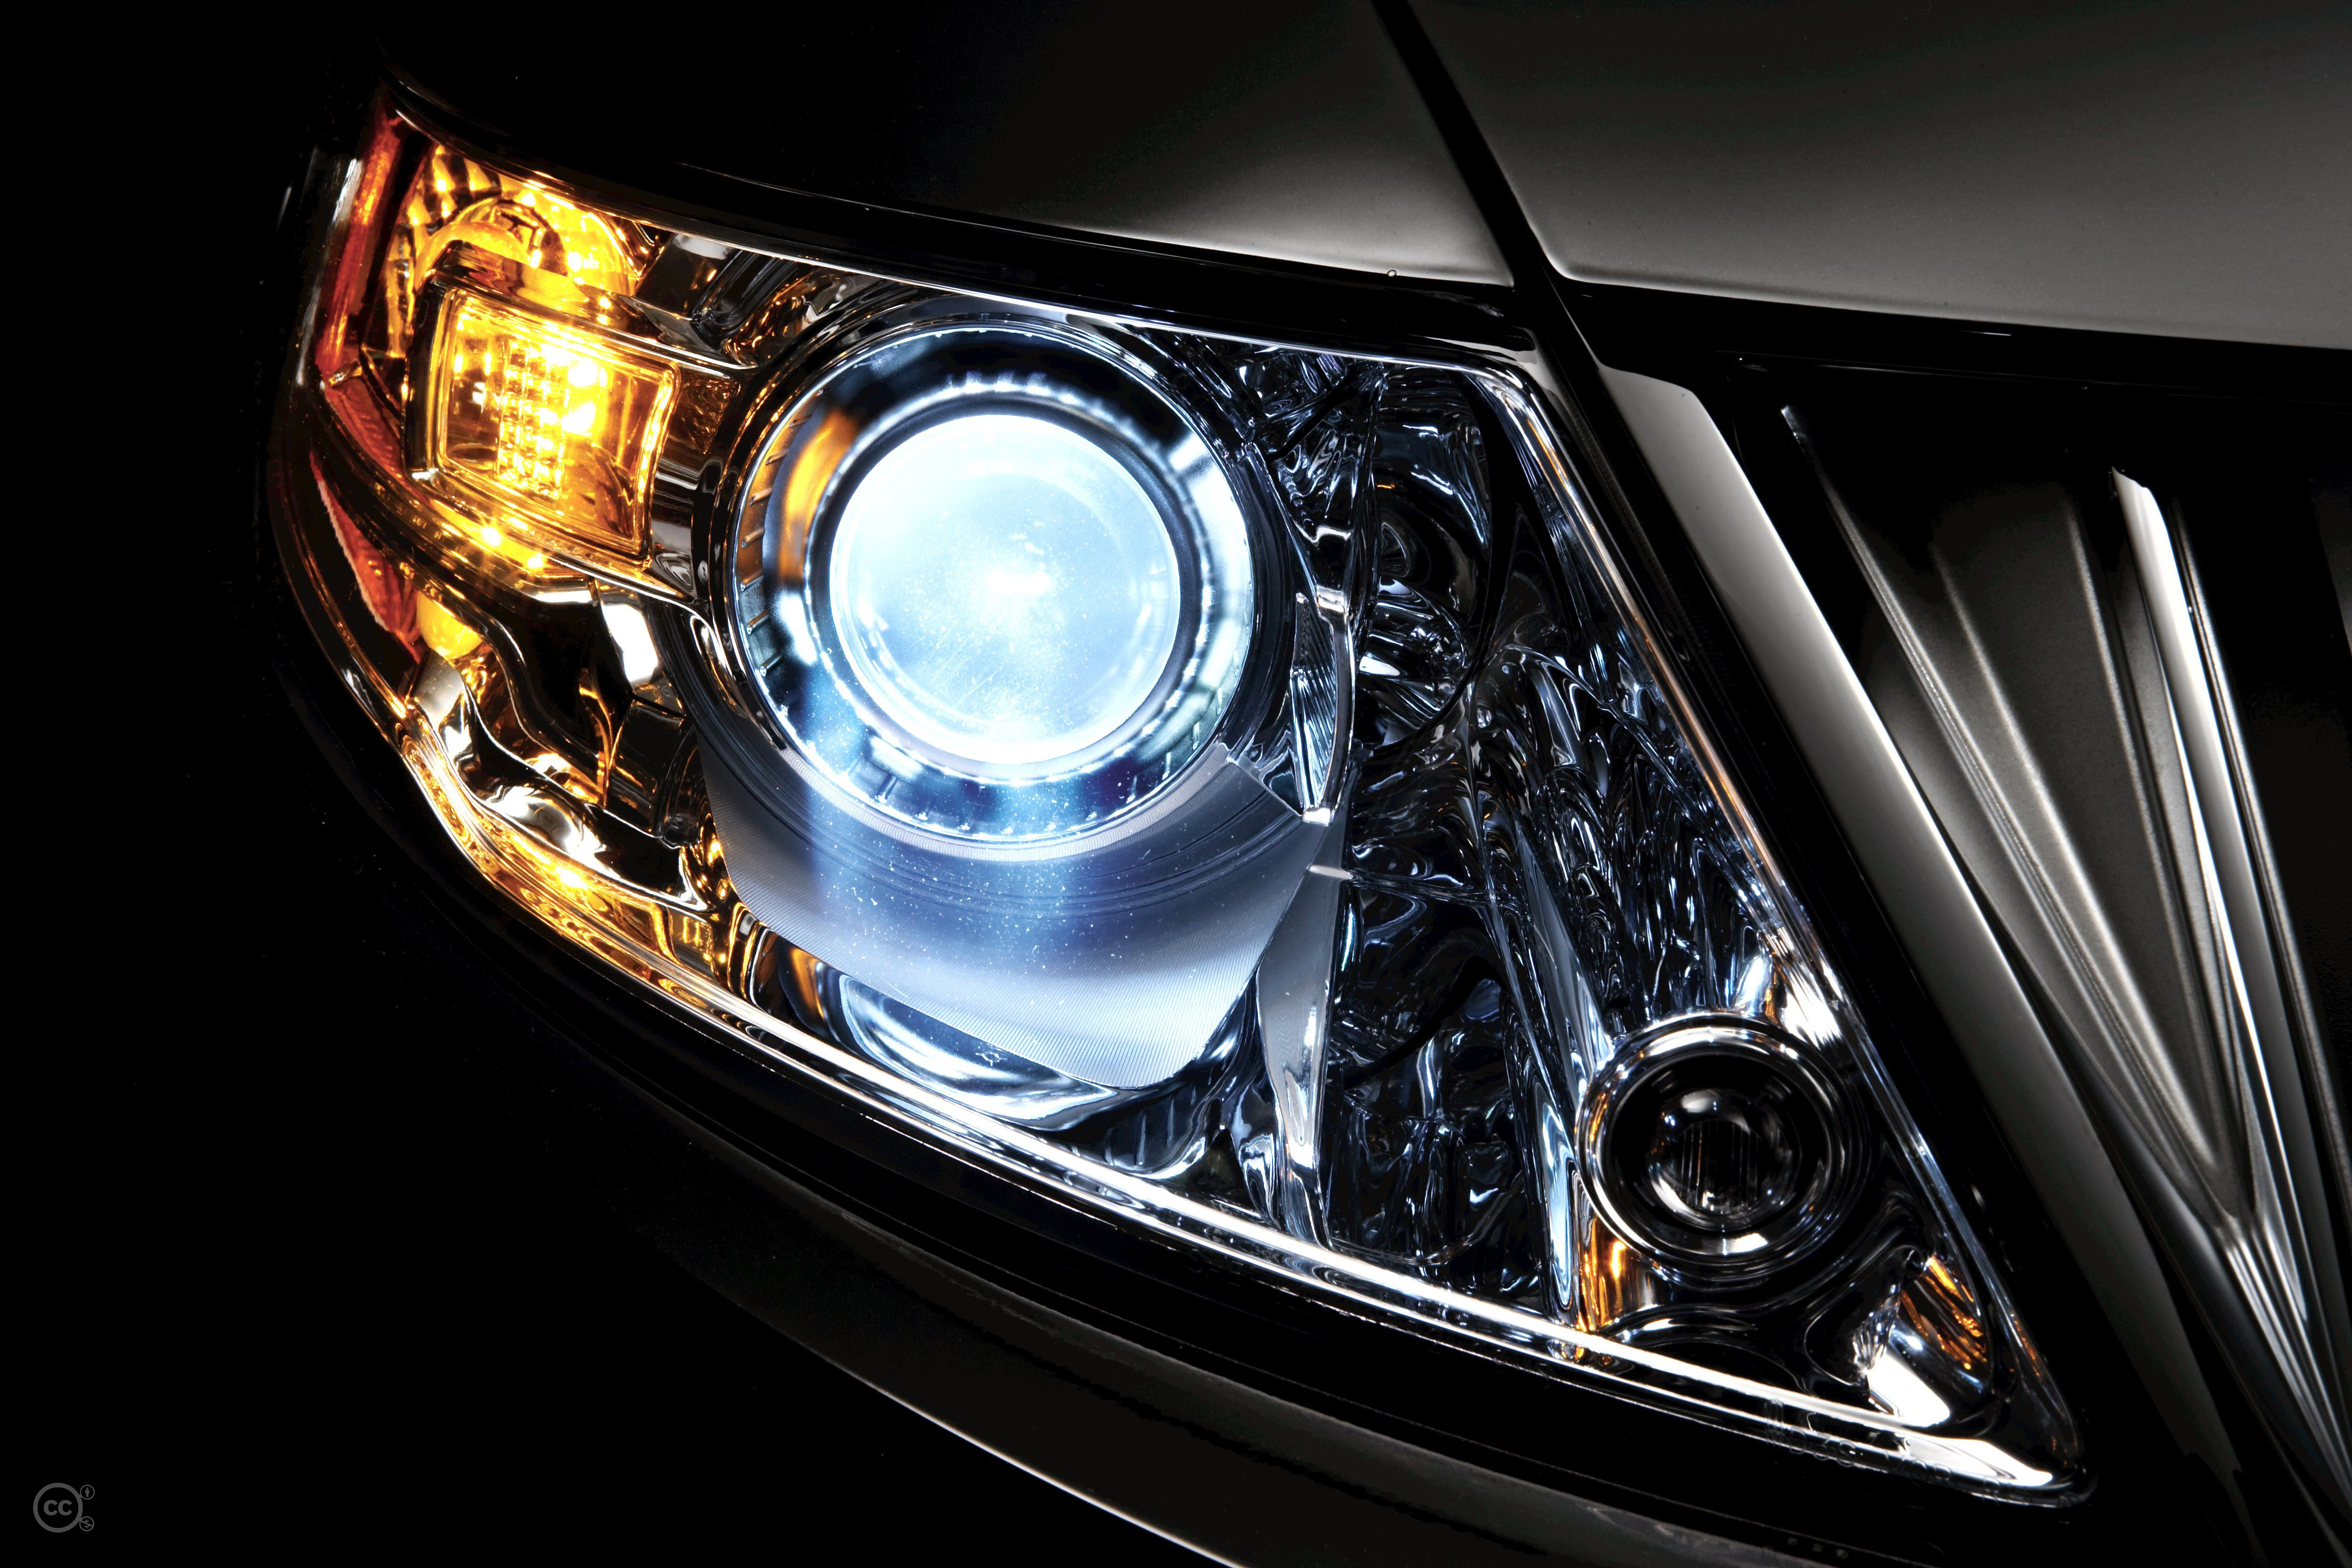 window things toys car glass auto rialto performance automotive hid center xenon lighting lights headlights